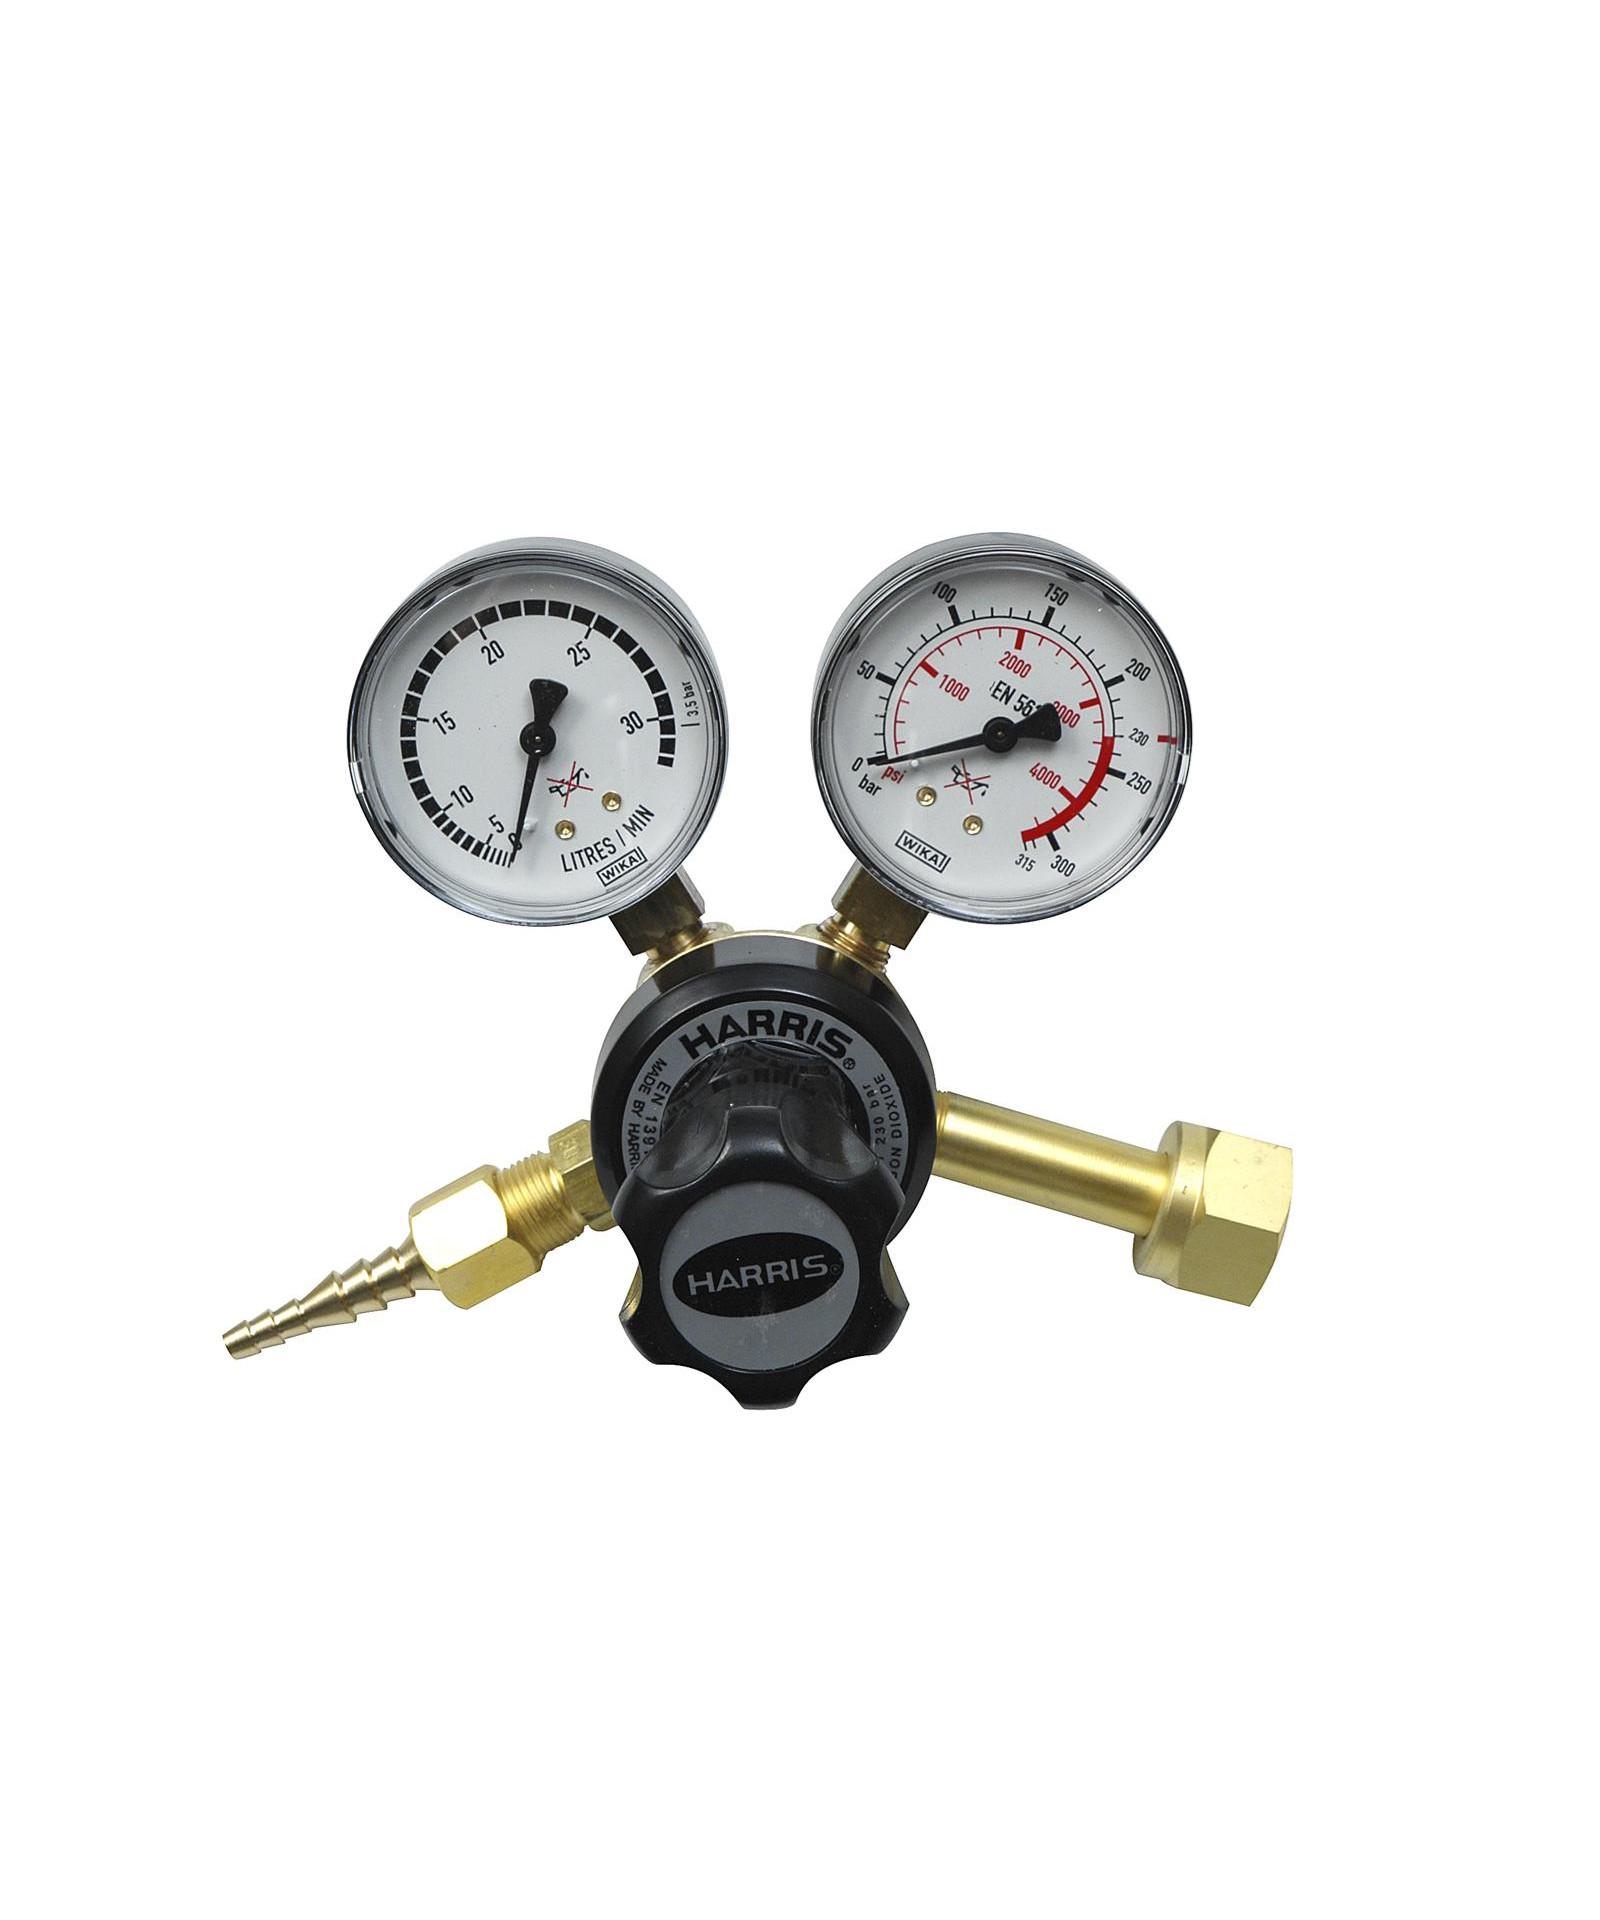 Harris 801 reduktionsventil - CO2